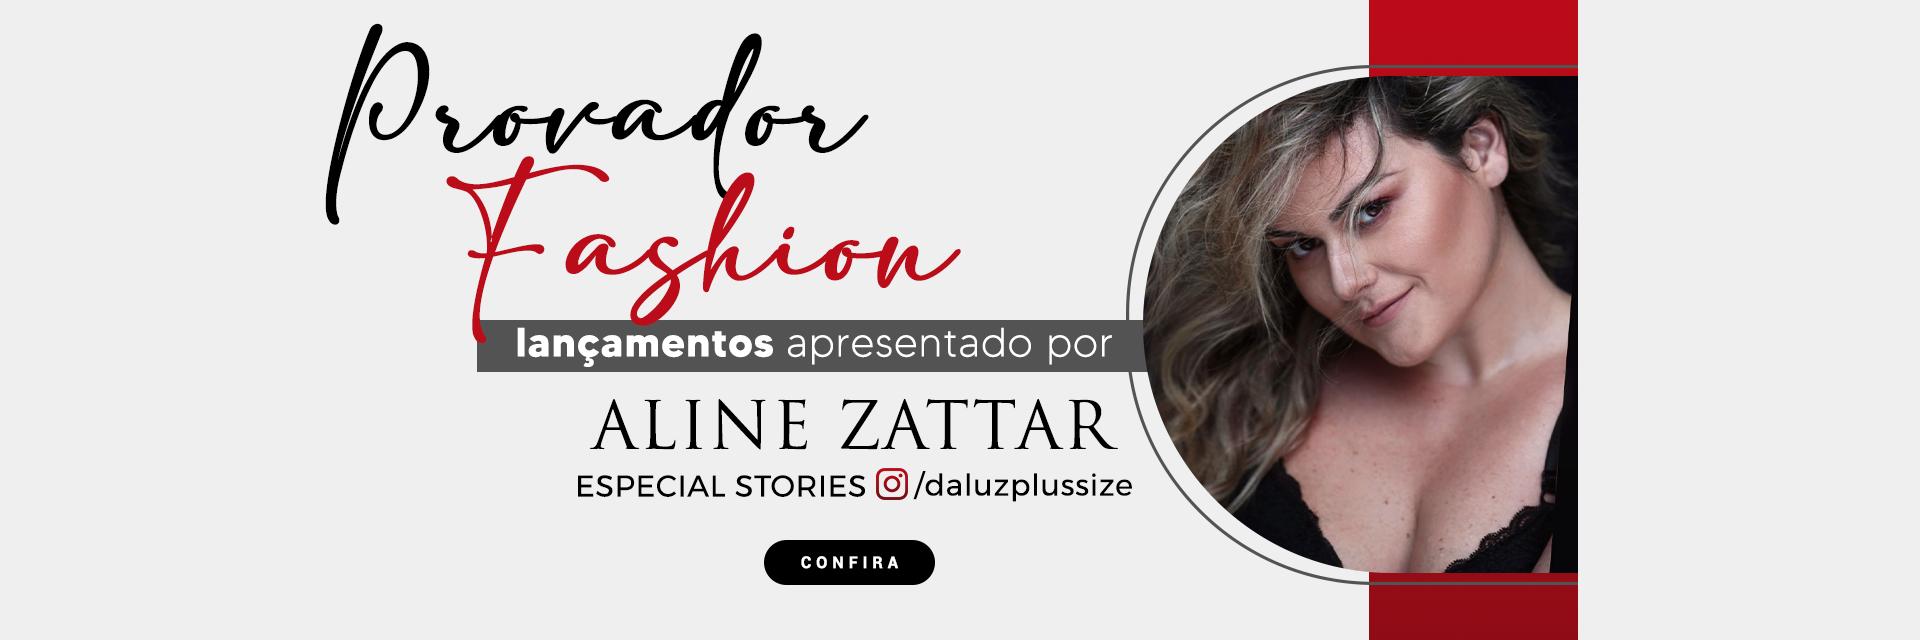 Provador Fashion Aline Zattar